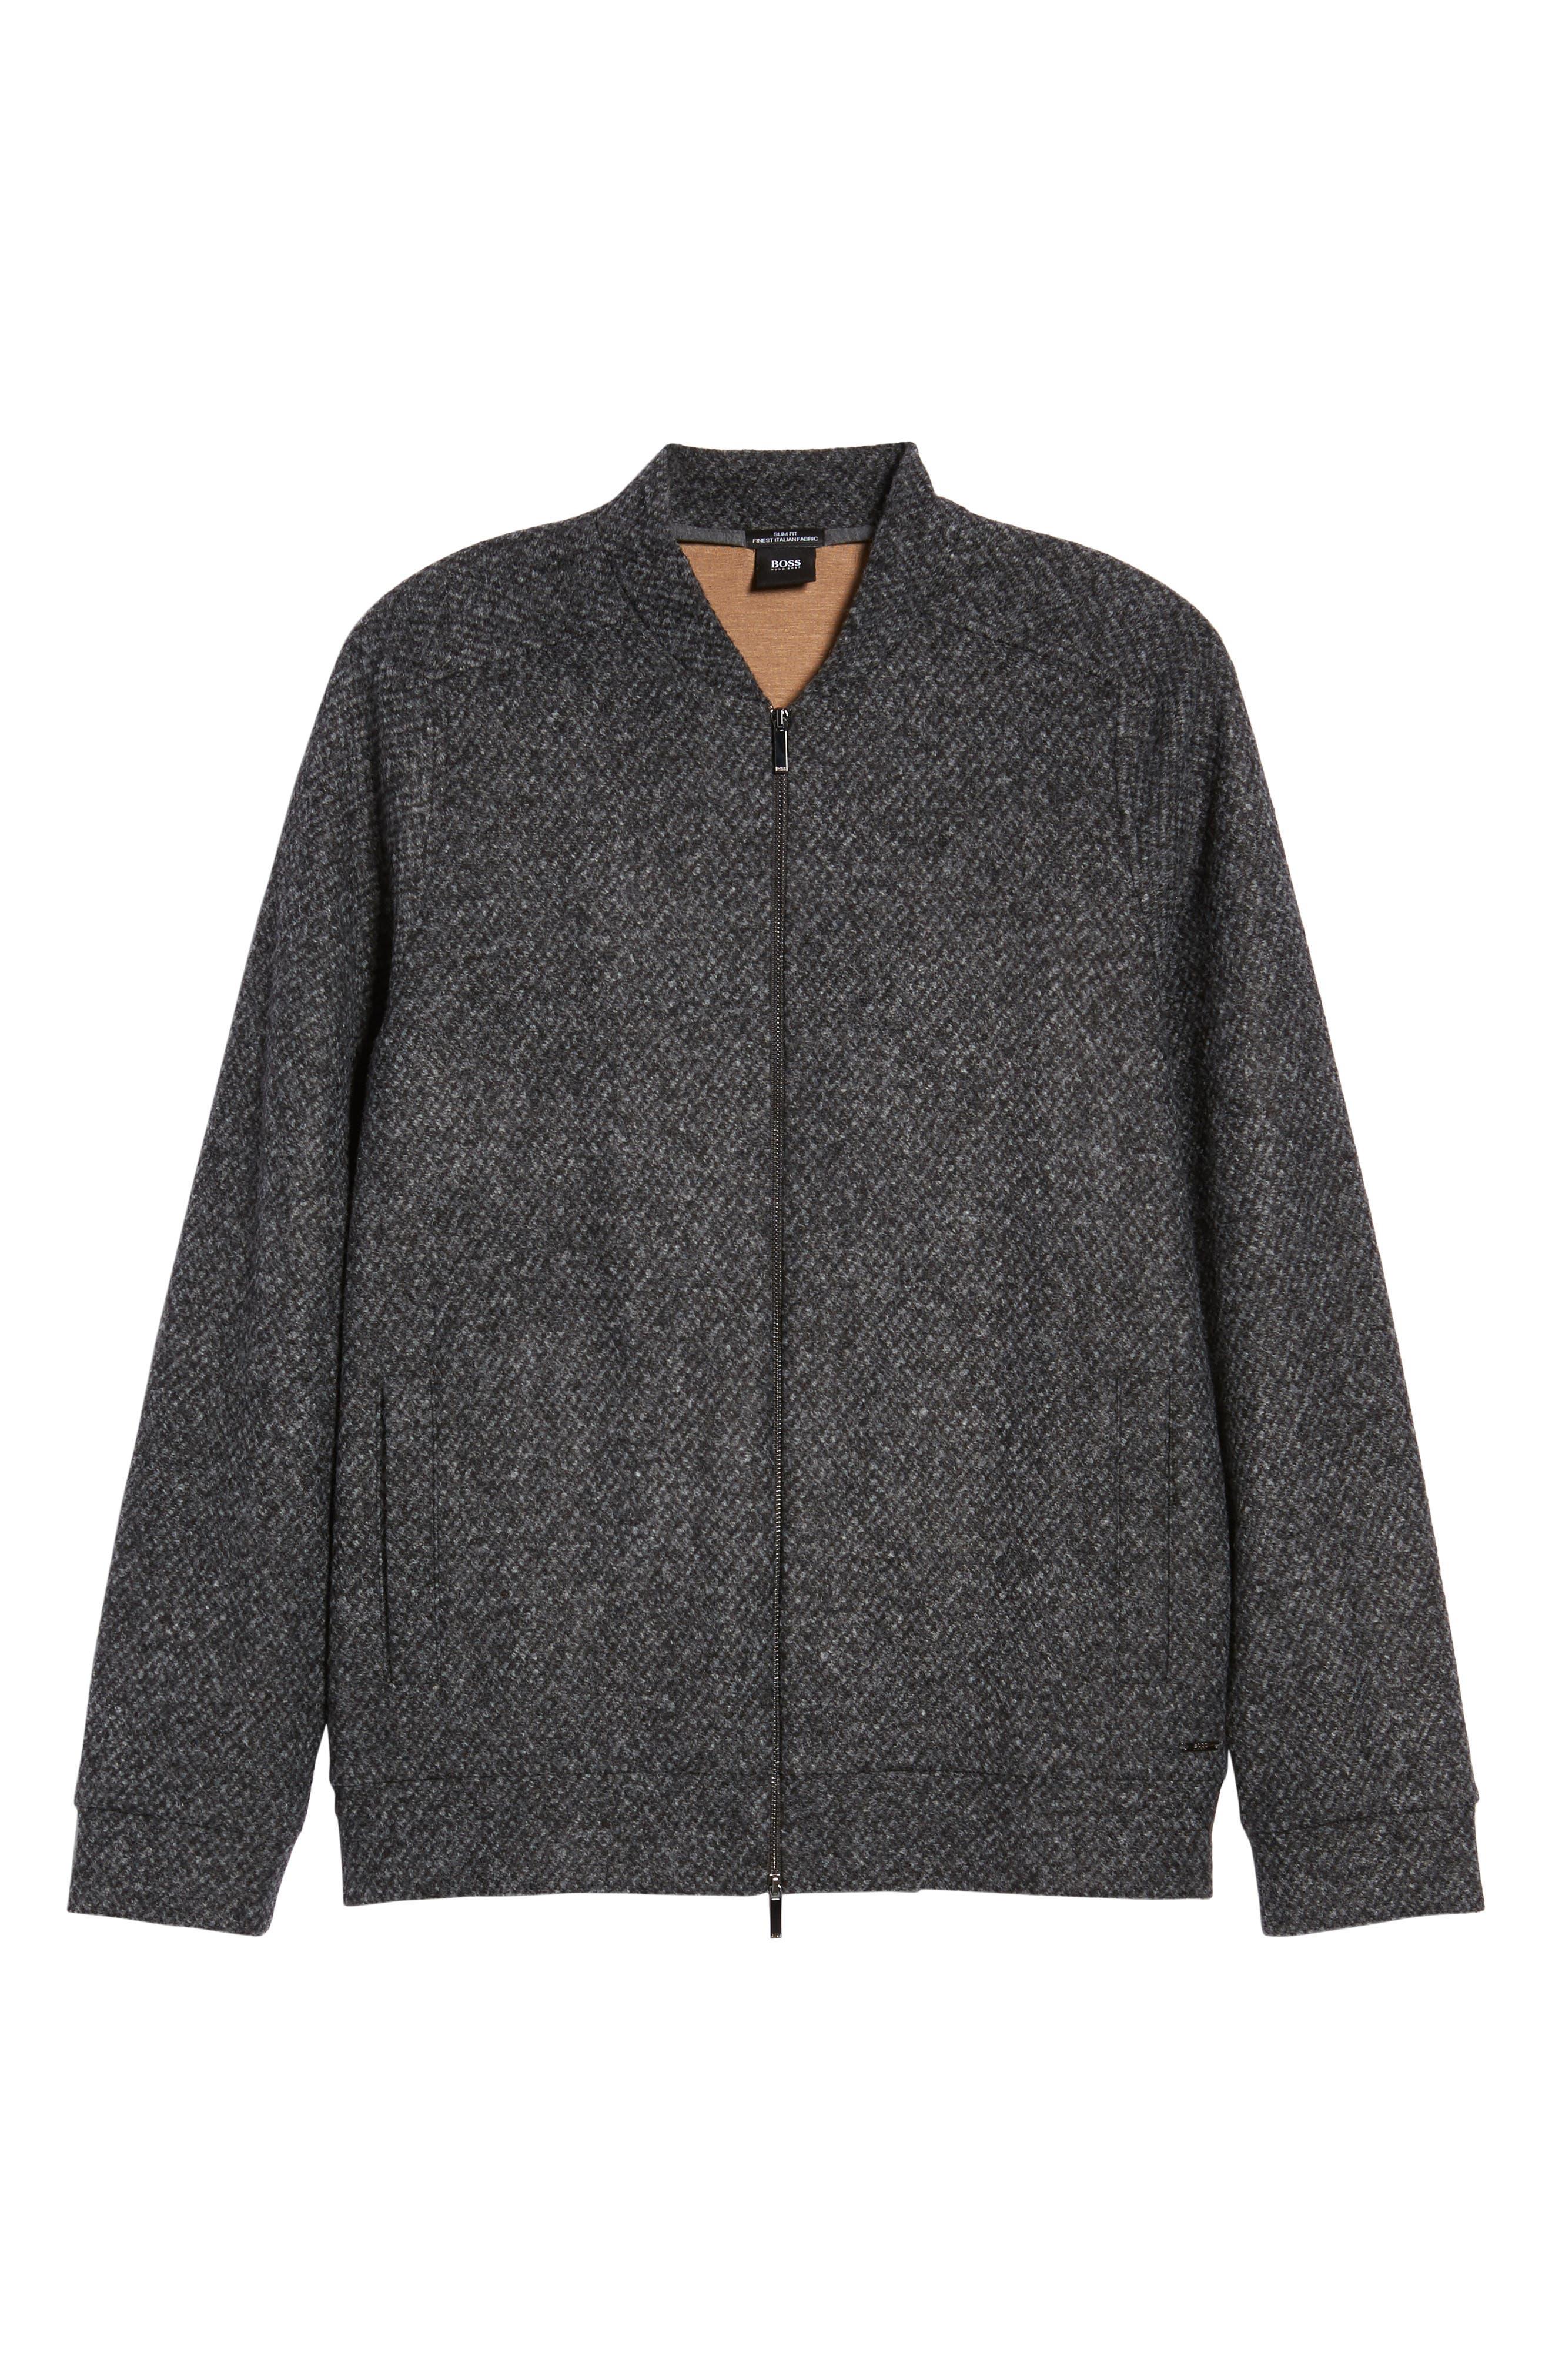 Salea Slim Fit Bomber Jacket,                             Alternate thumbnail 5, color,                             Grey